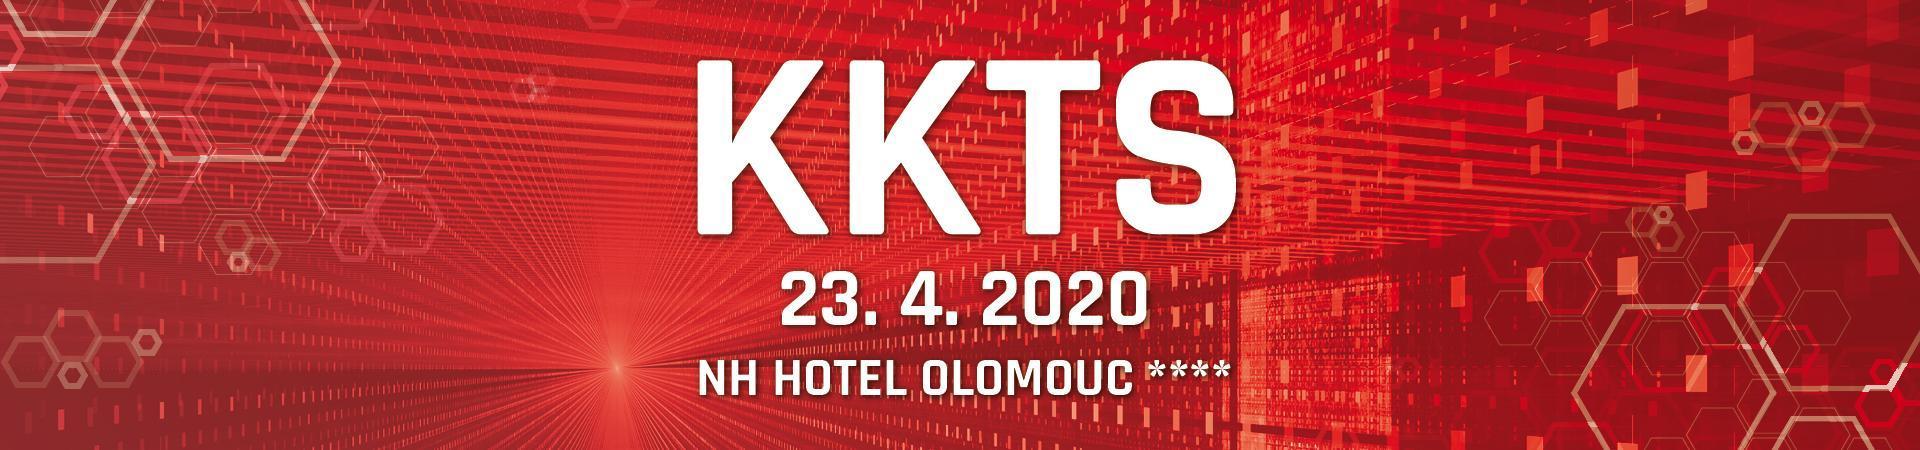 KKTS Olomouc 2020 Konference